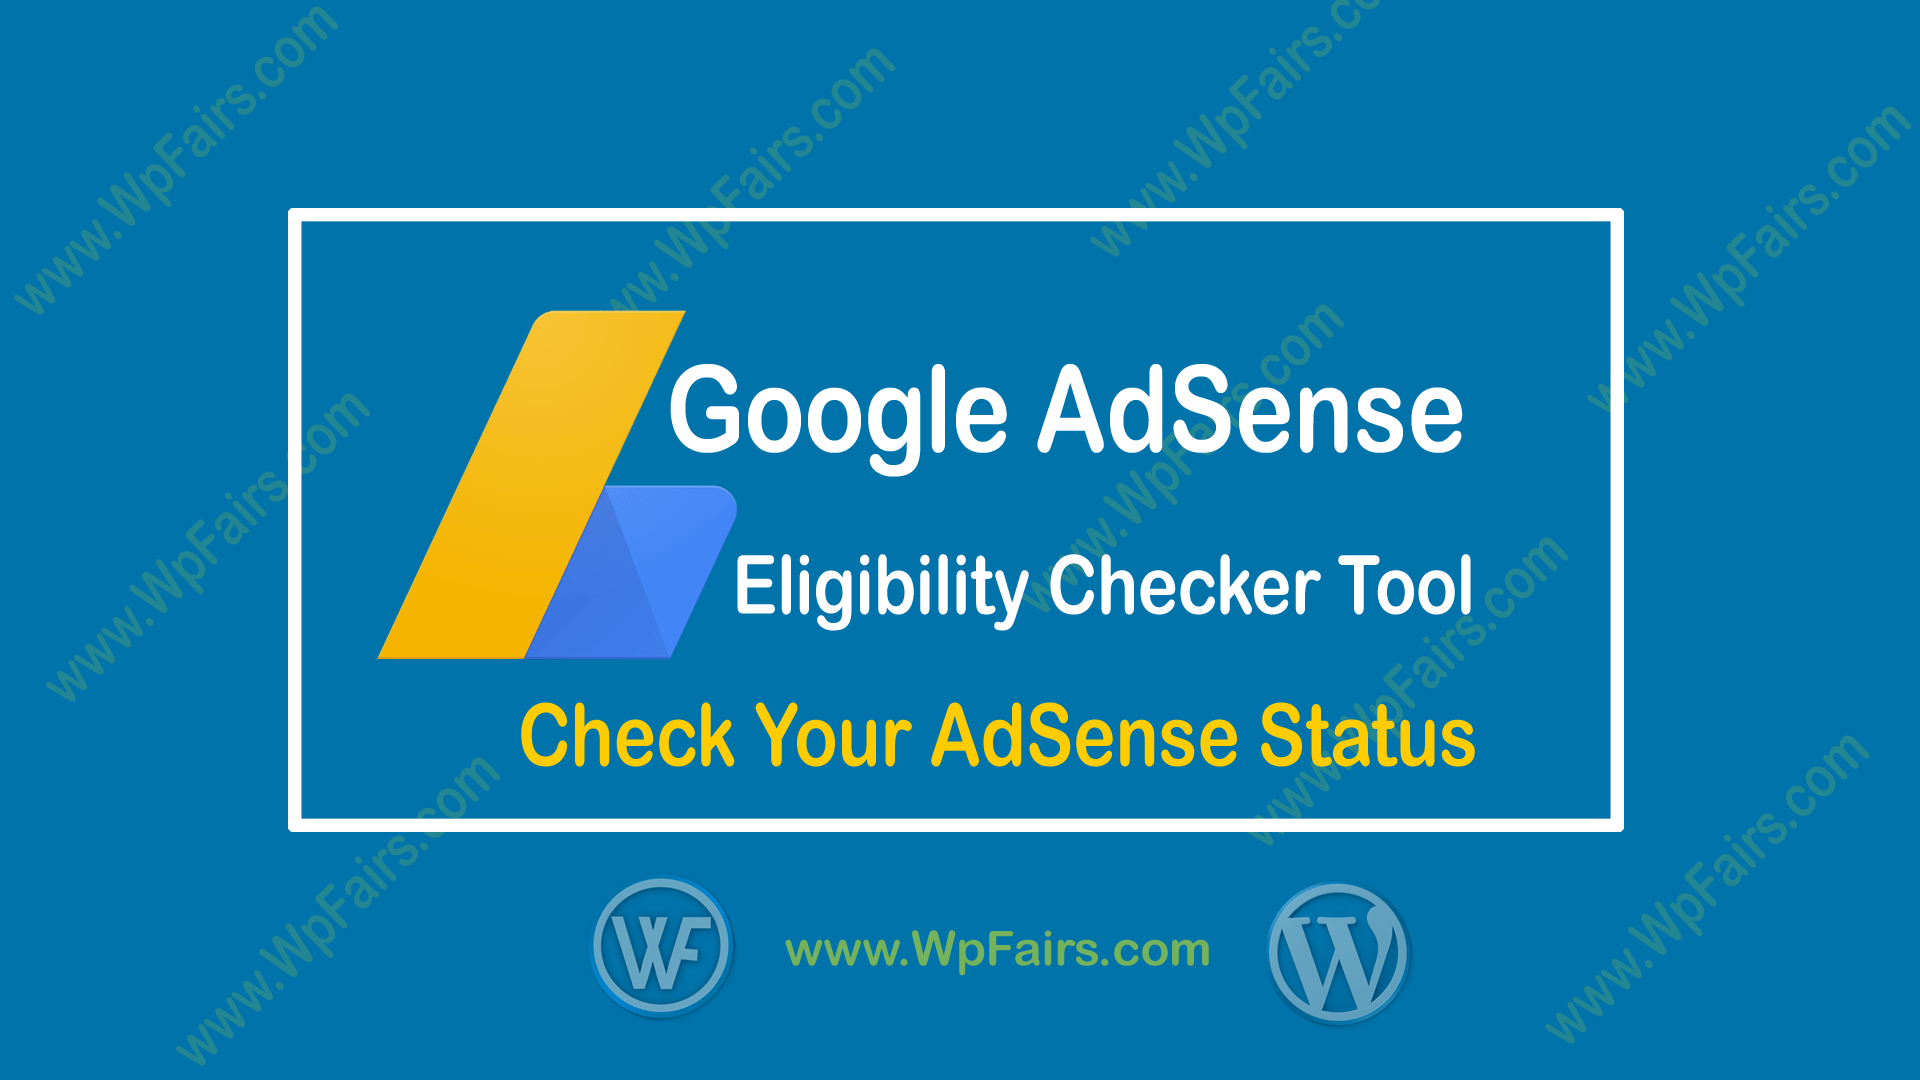 Google AdSense Eligibility Checker Tool – Check Your AdSense Status - wpFairs